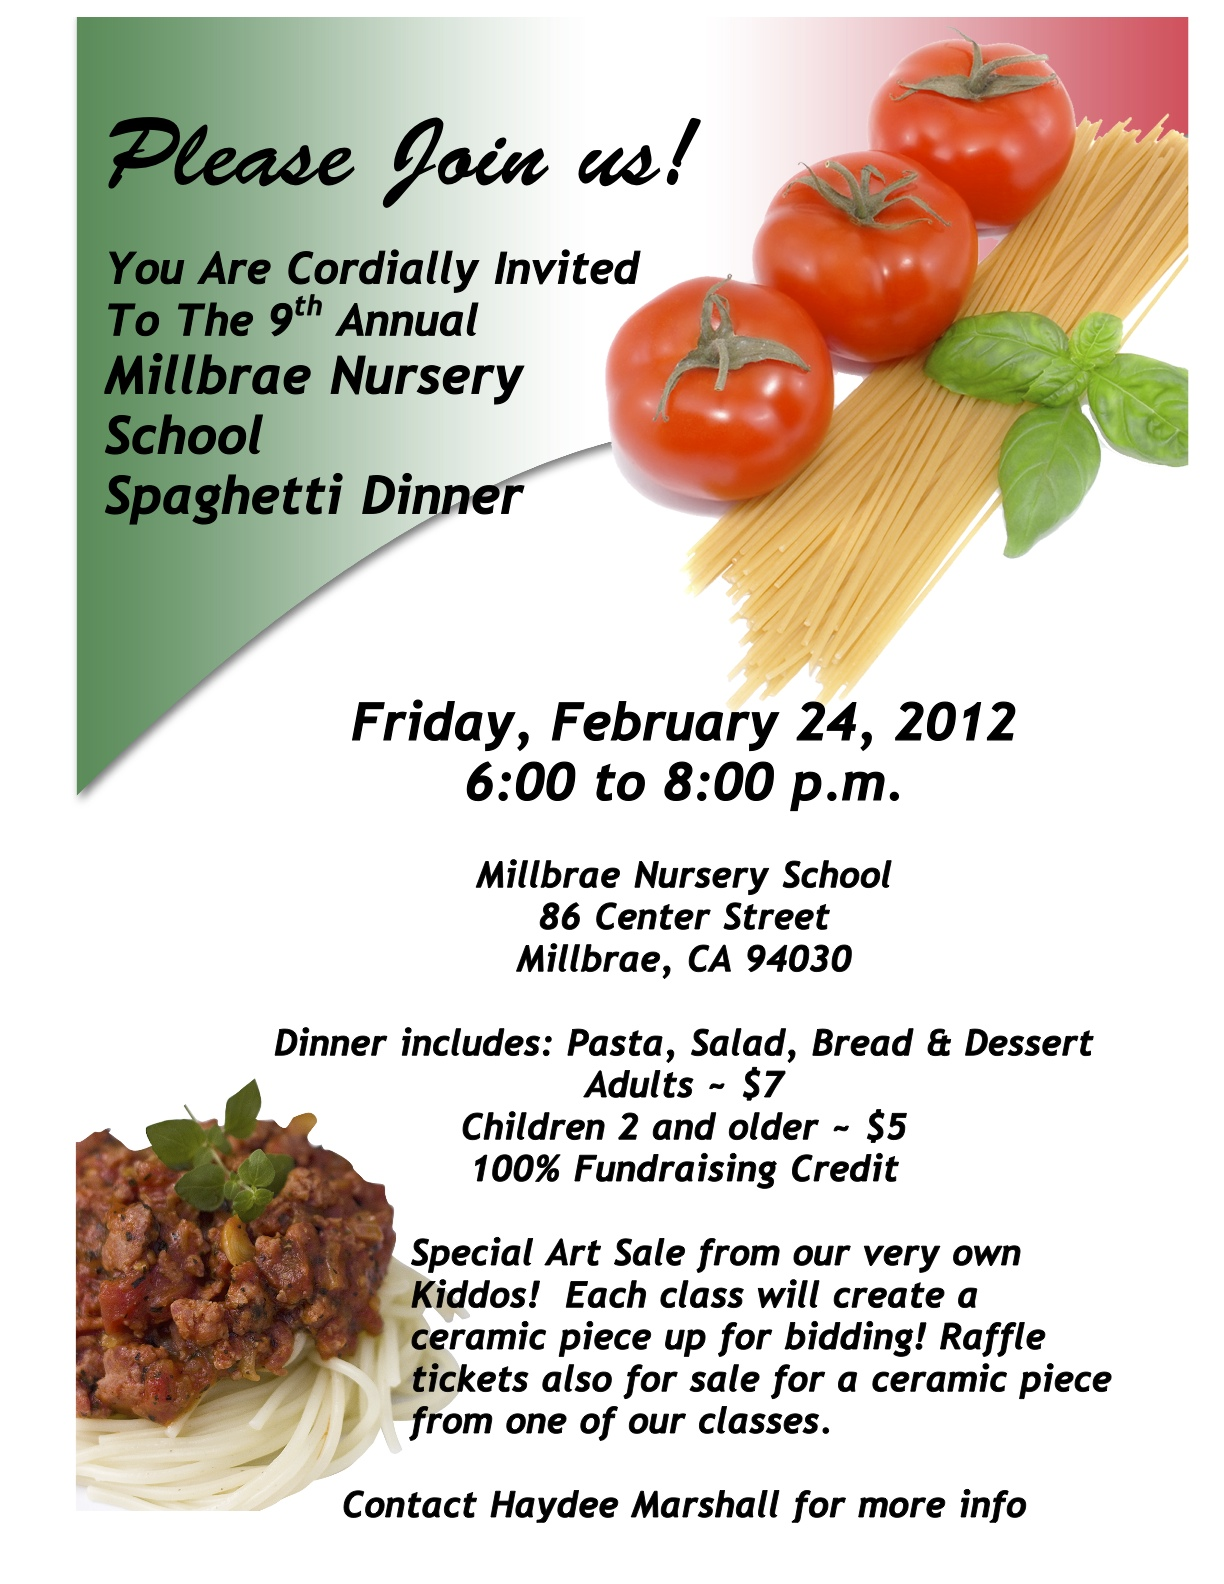 spaghetti fundraiser clipart clipart kid millbrae nursery school spaghetti dinner fundraiser san mateo county